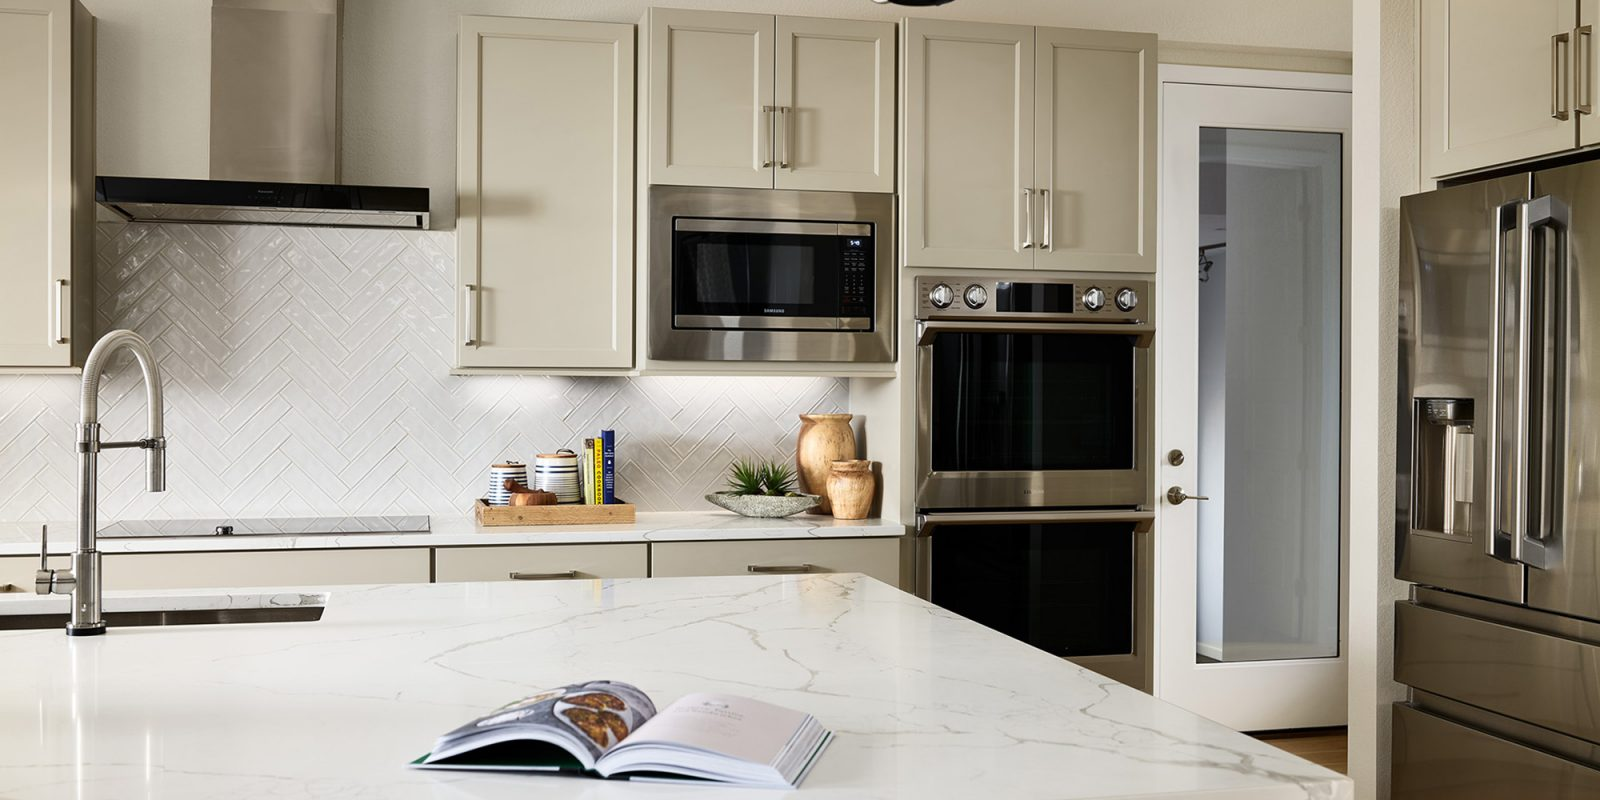 Vitality Collection: Revive - Kitchen Appliances